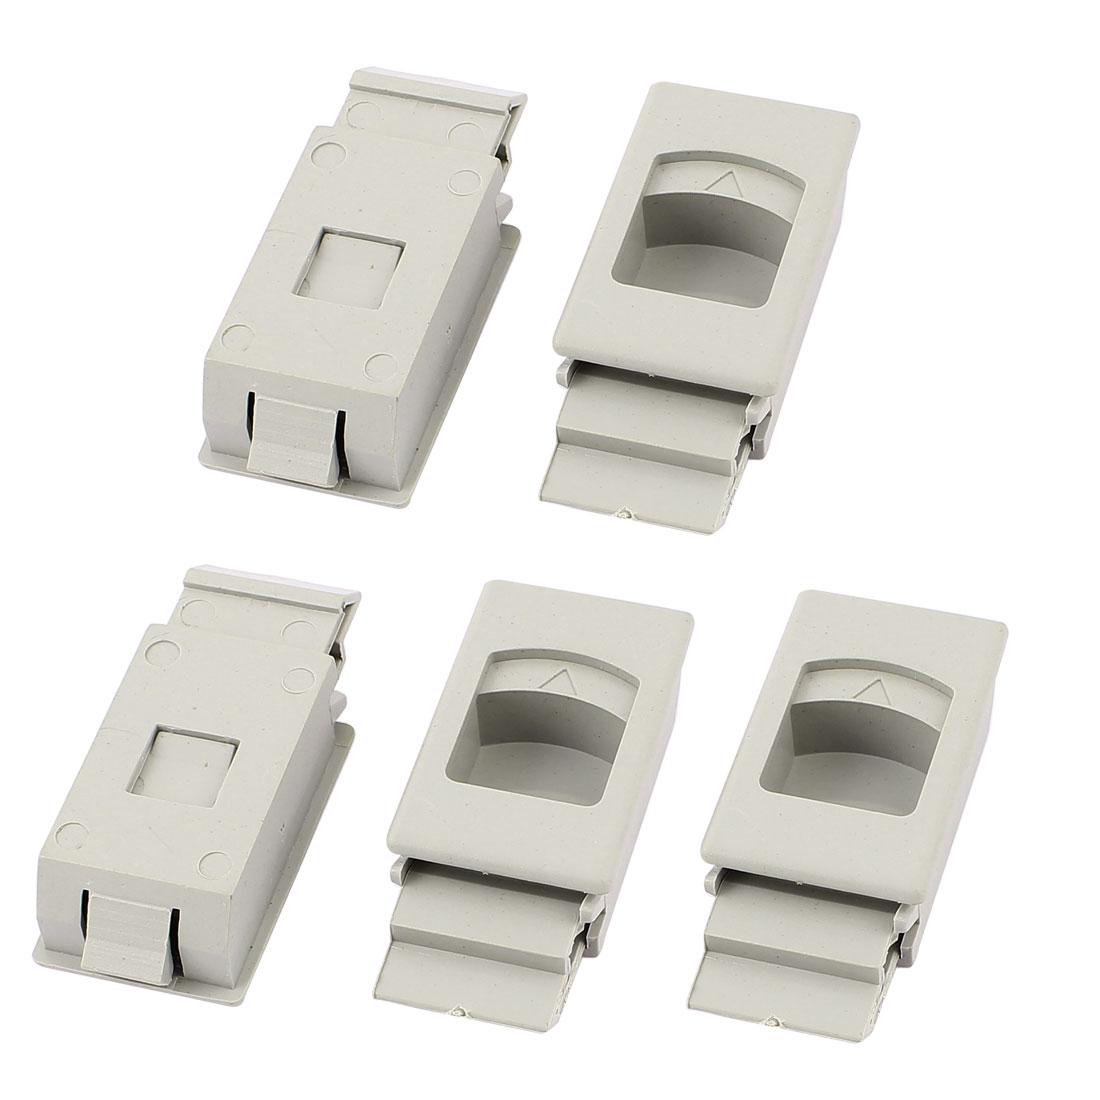 Cabinet Cupboard Drawer Inside Pull Triangle Mark Plastic Latch Gray 5pcs